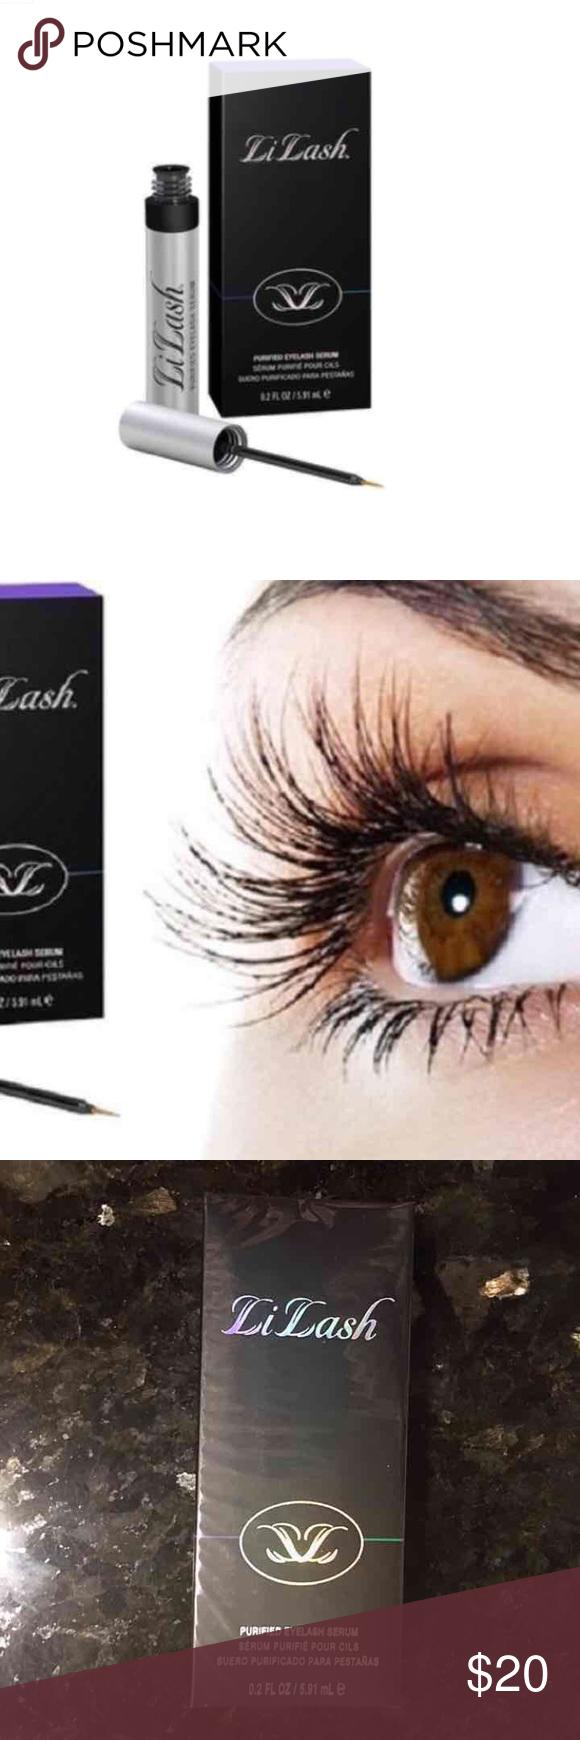 01695ba5b51 Lilash Eyelashes Growth Serum- BRAND NEW SEALED Brand New Lilash Purified Eyelash  Serum Unbelievable Results